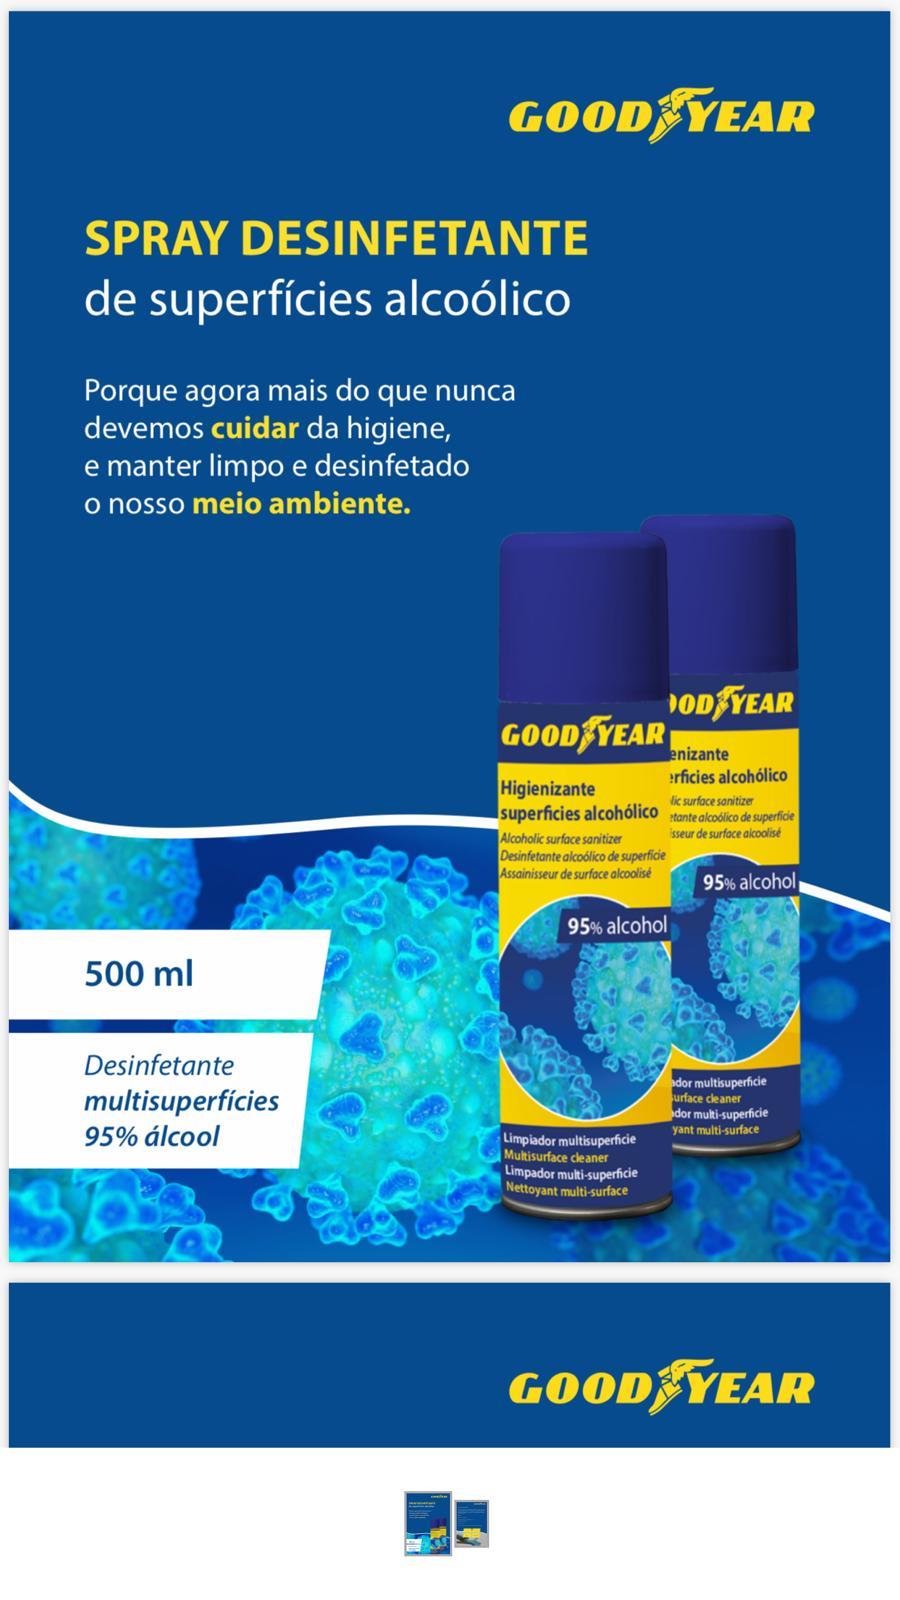 Higienizante superficies Goodyear 500 ml